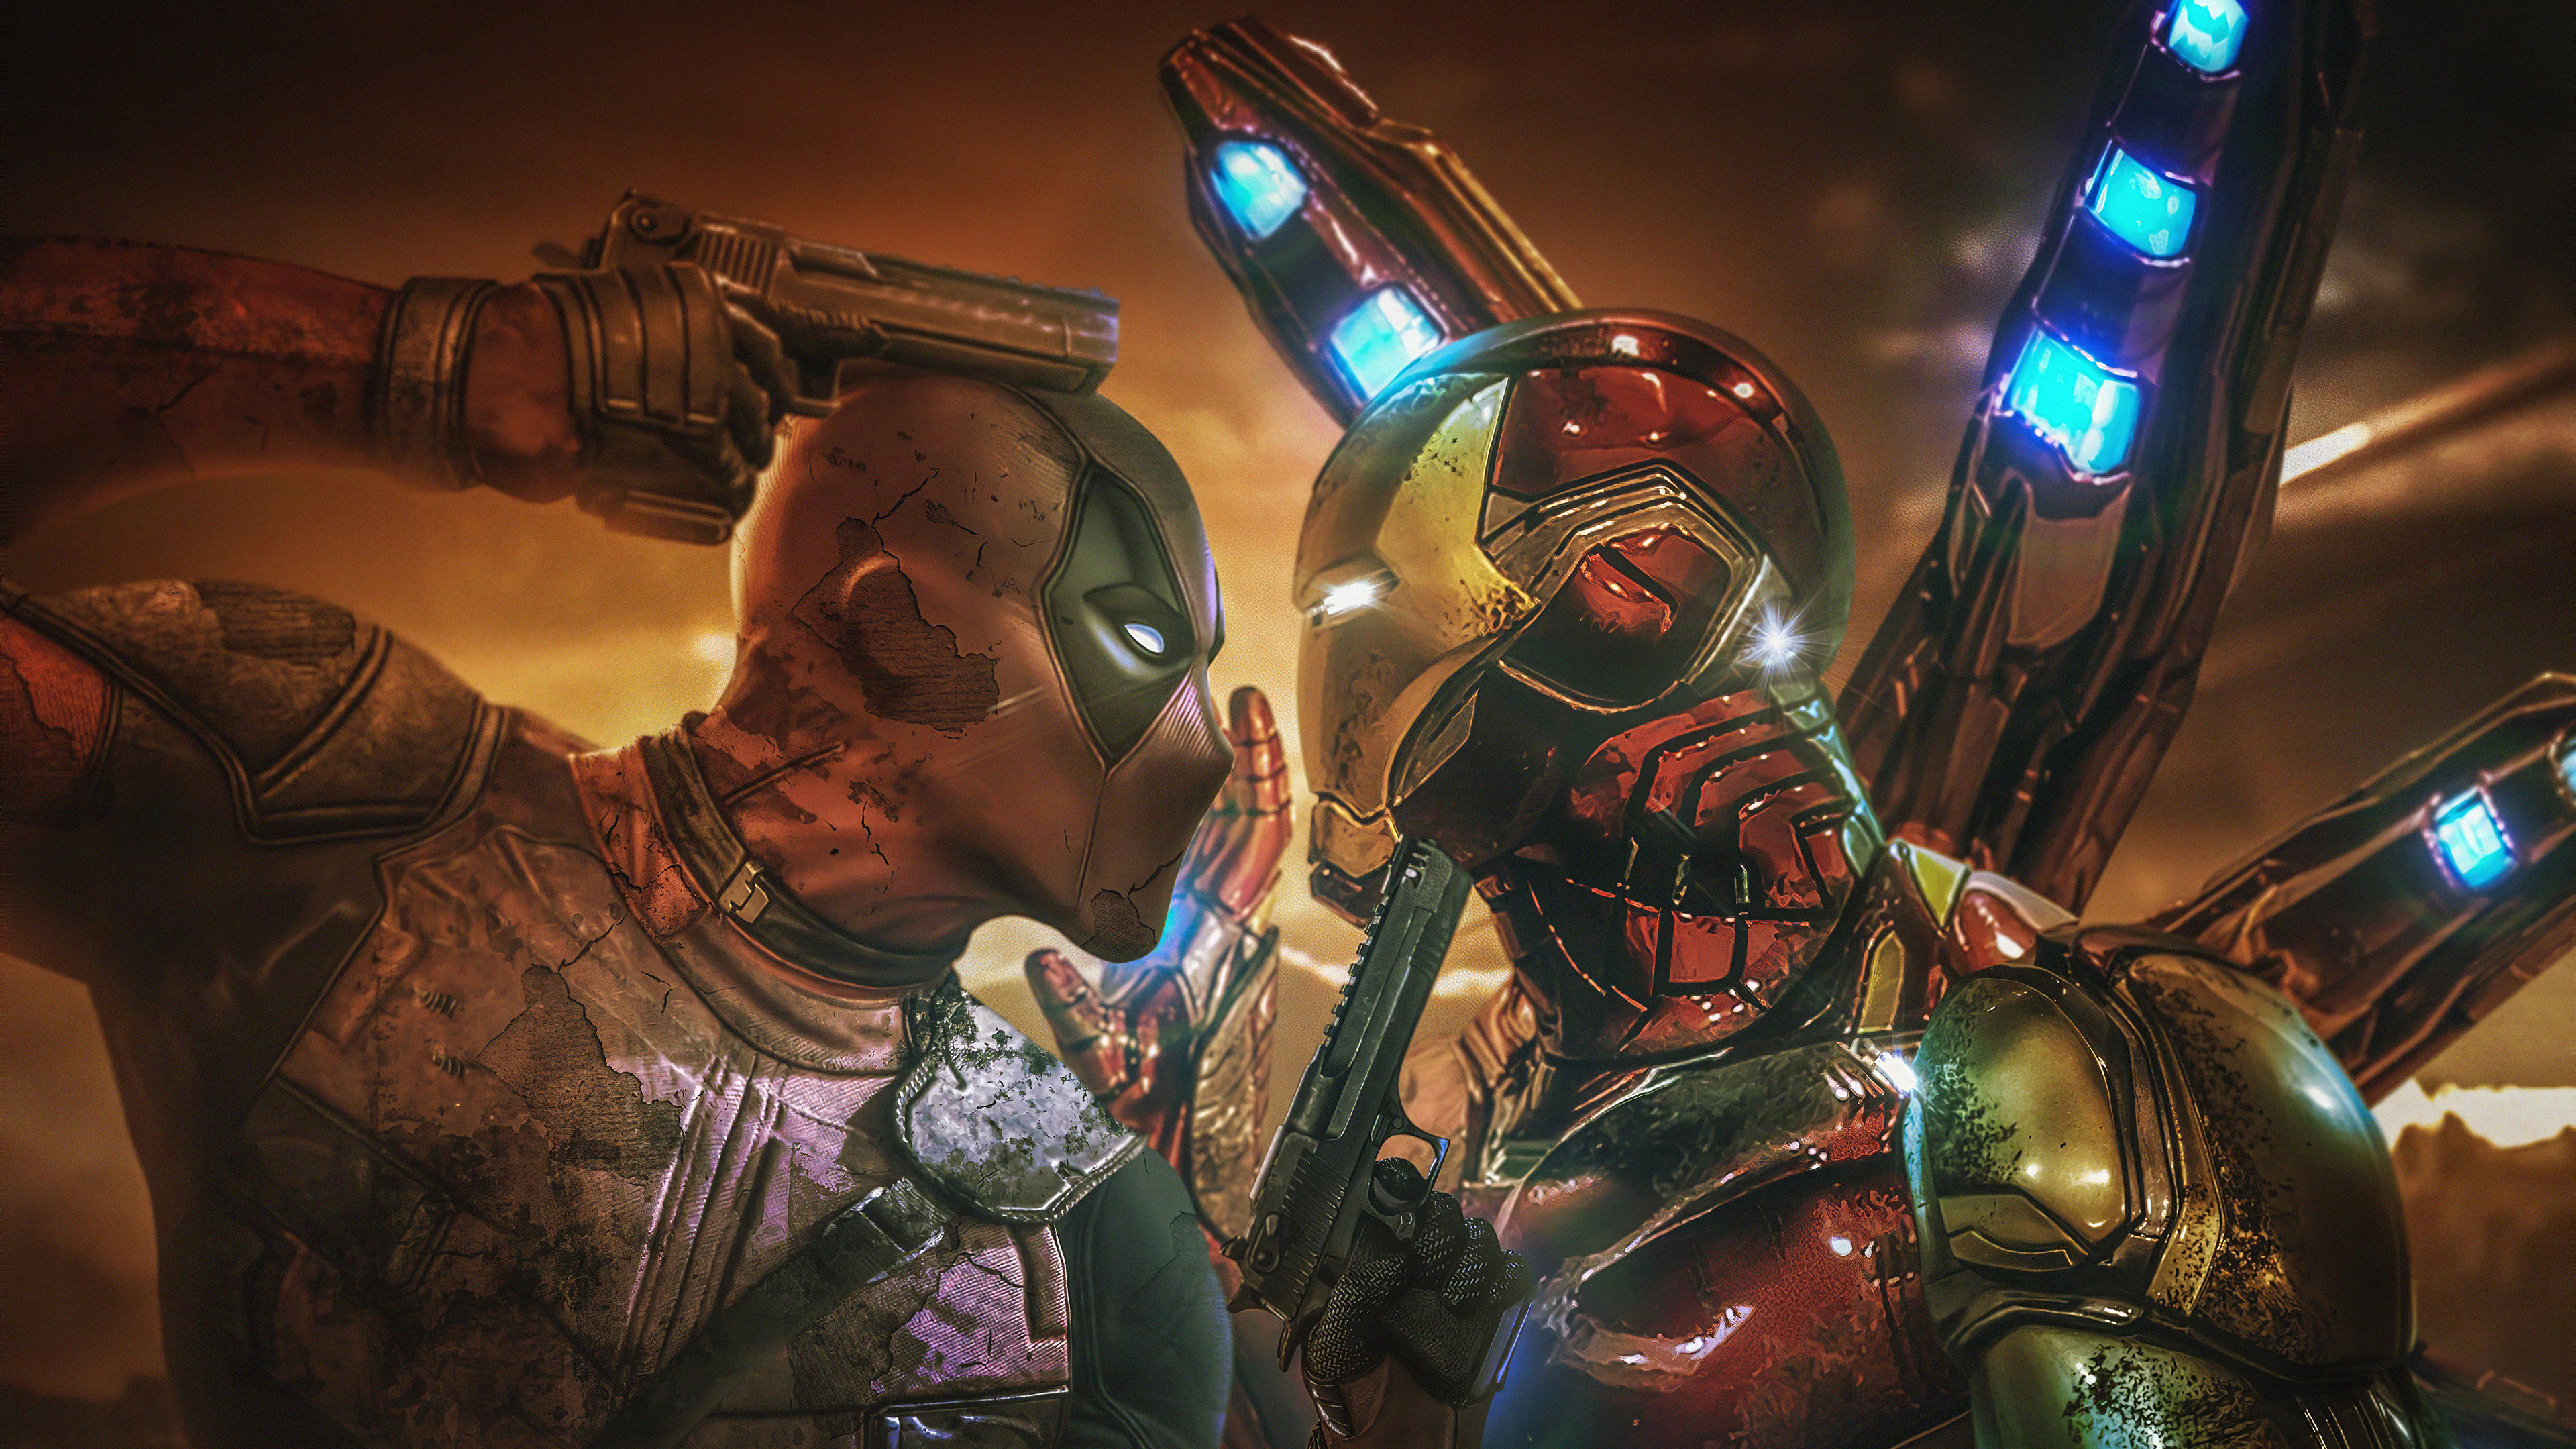 deadpool vs iron man 4k 1576090215 - Deadpool Vs Iron Man 4k - deadpool vs ironman wallpaper 4k